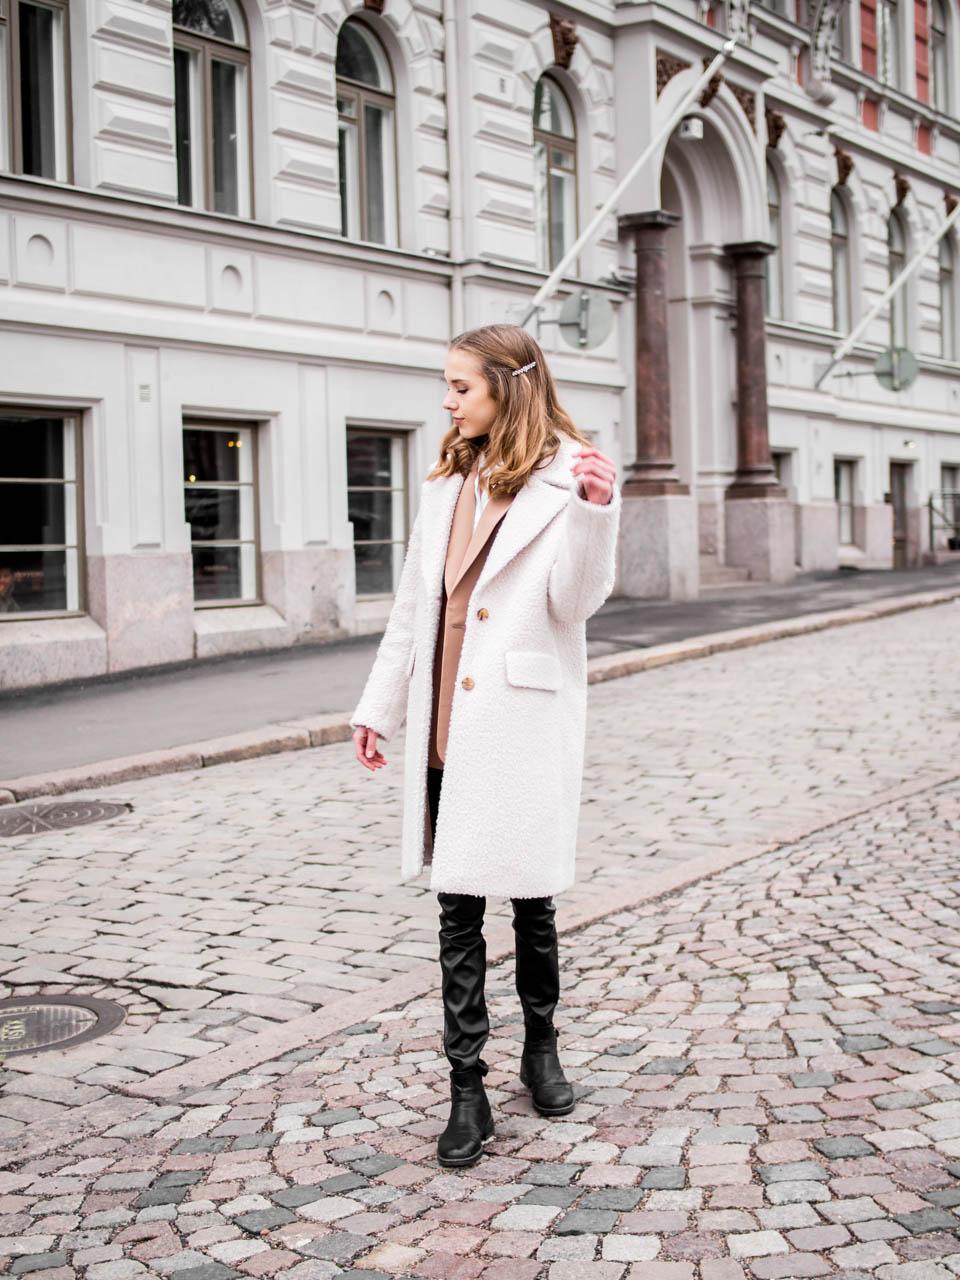 Winter outfit with teddy coat and faux leather leggings - Talvimuoti, teddy-takki, tekonahkaleggingsit